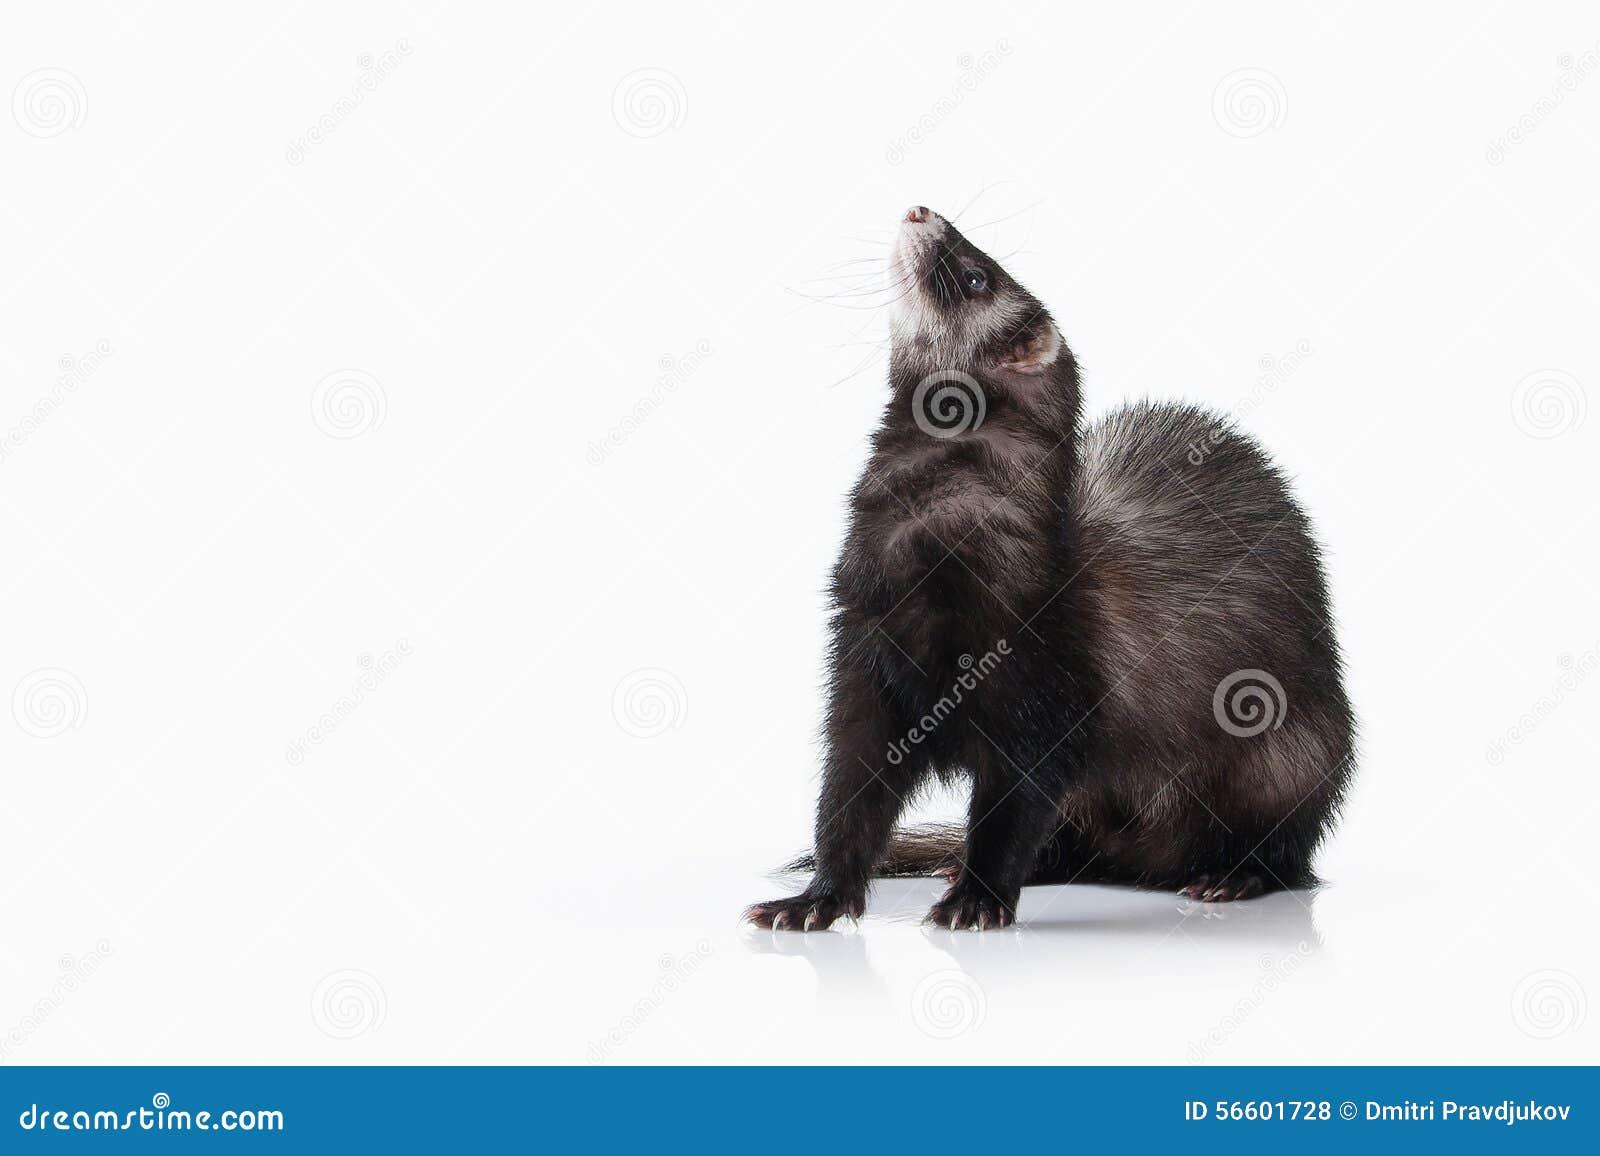 Animal. Old ferret on white background